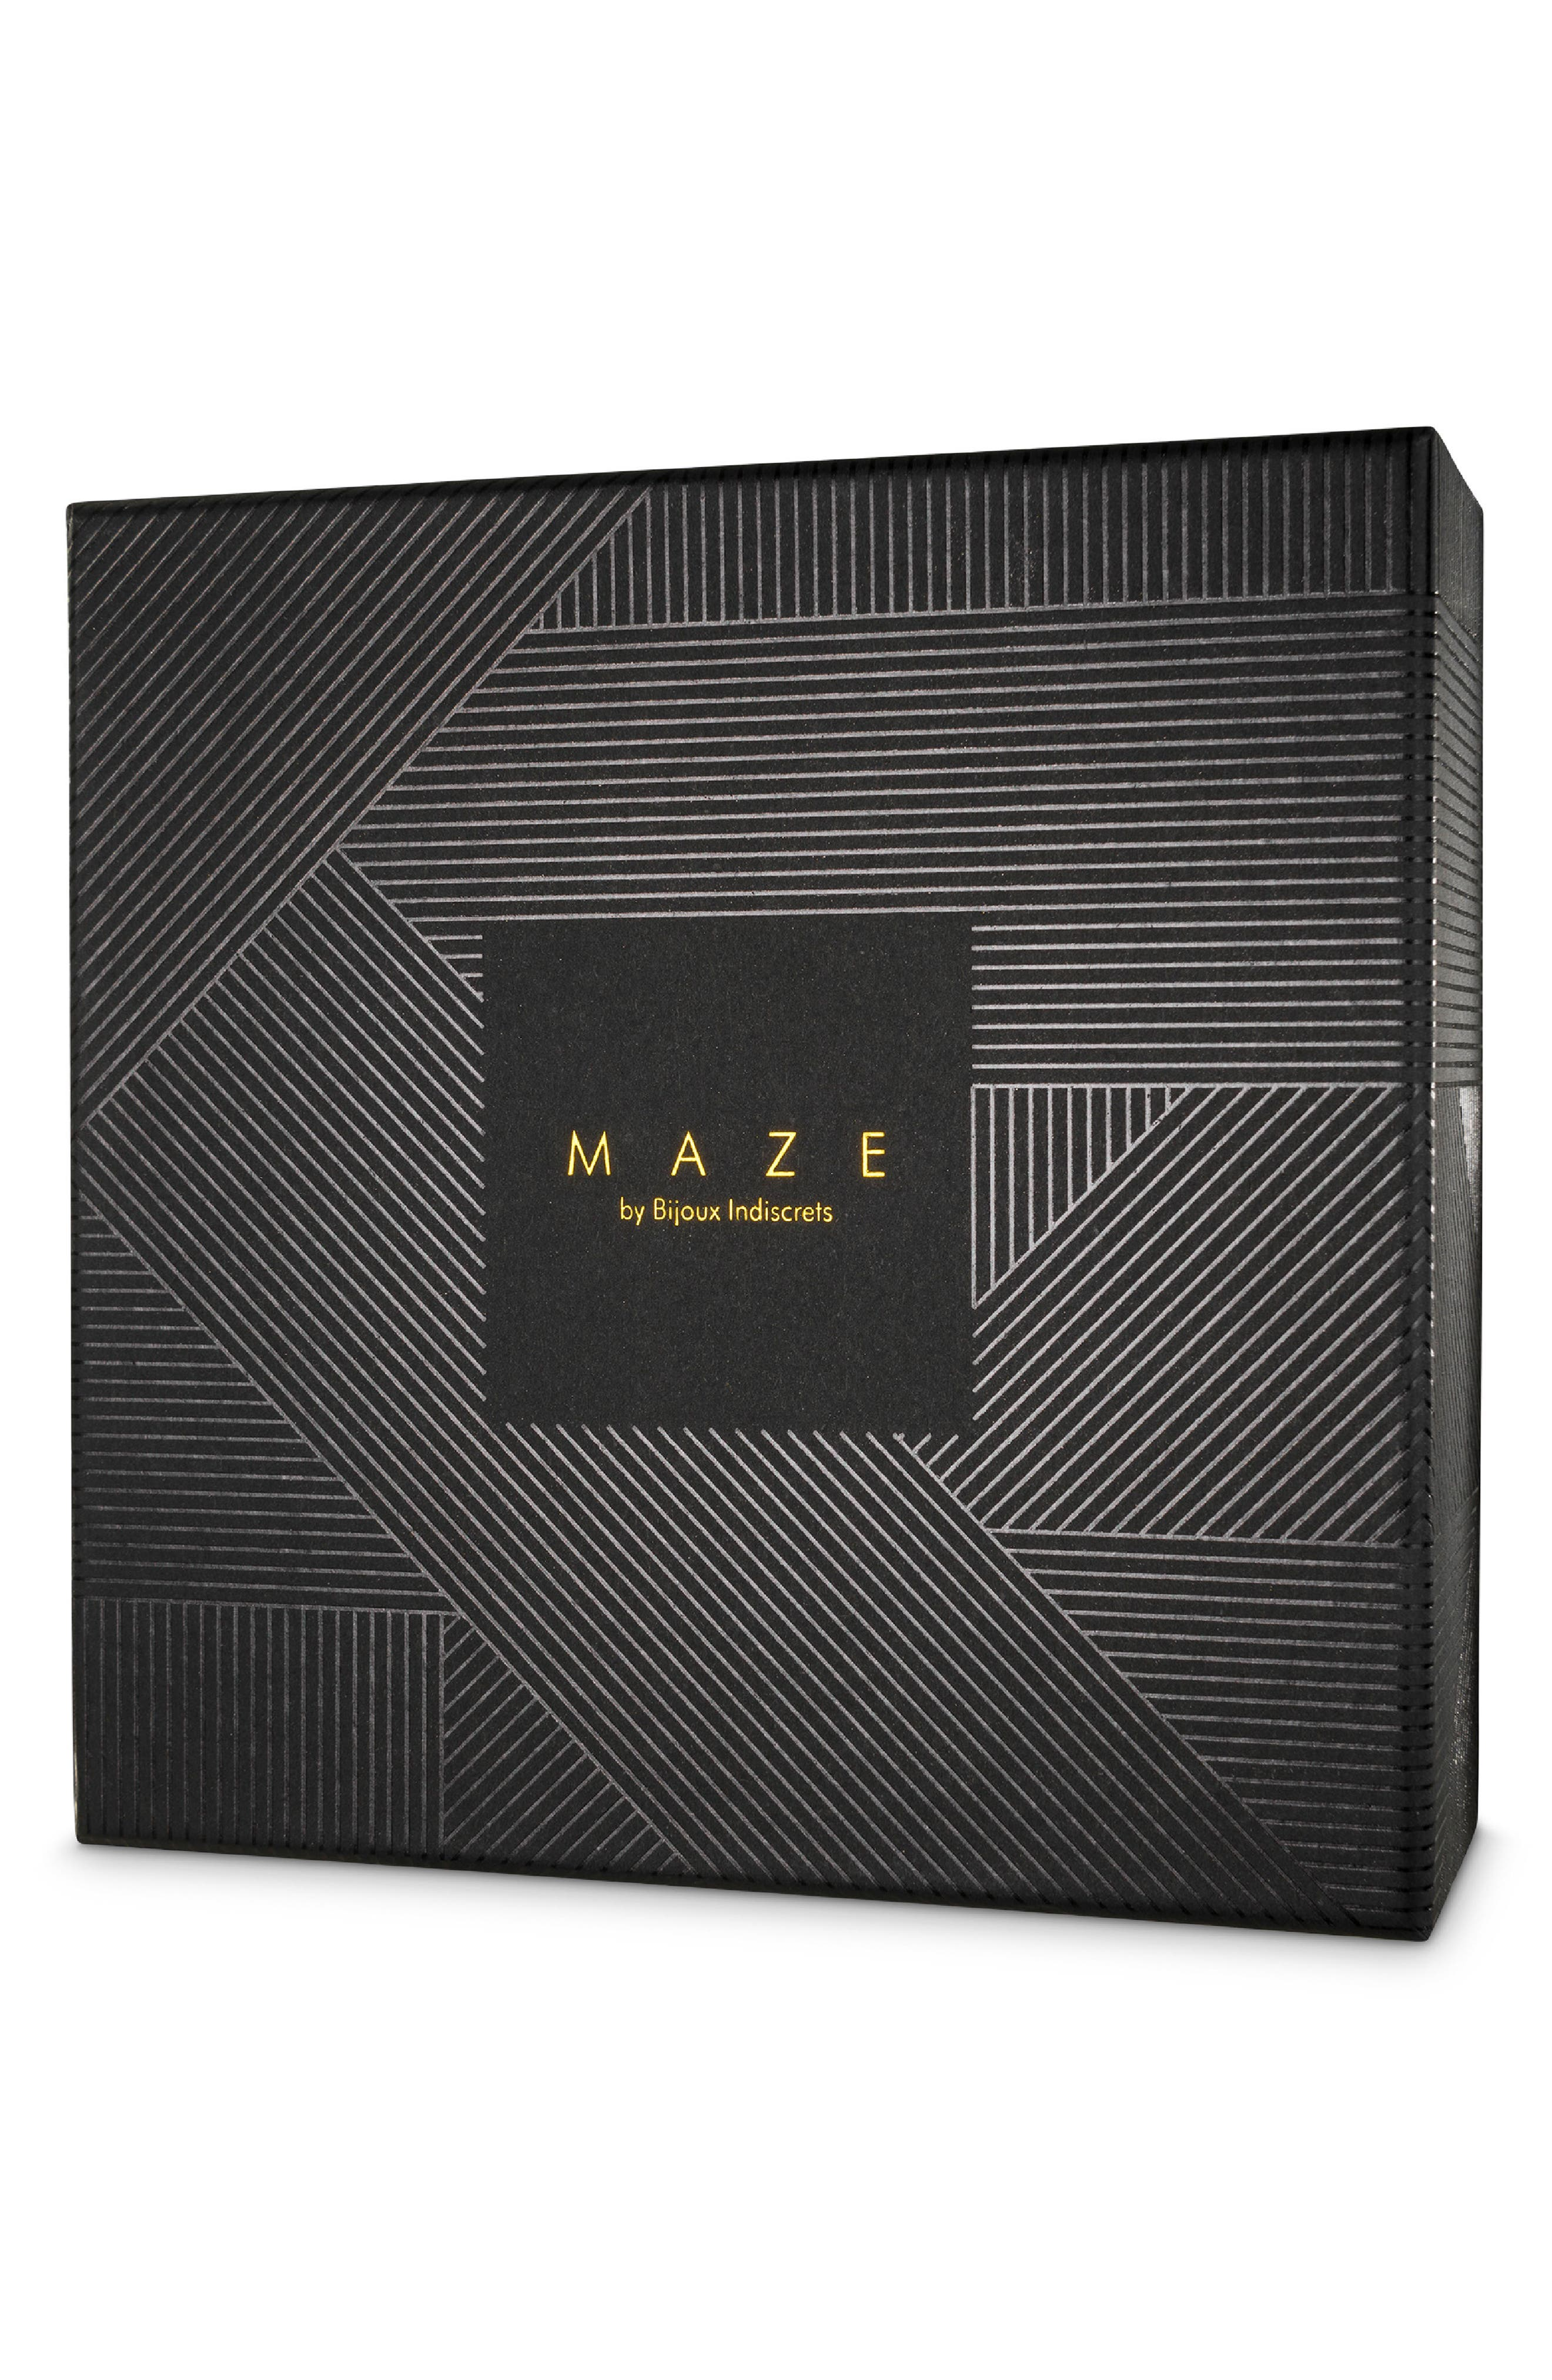 Maze Suspender Belt & Garter Straps,                             Alternate thumbnail 6, color,                             Black